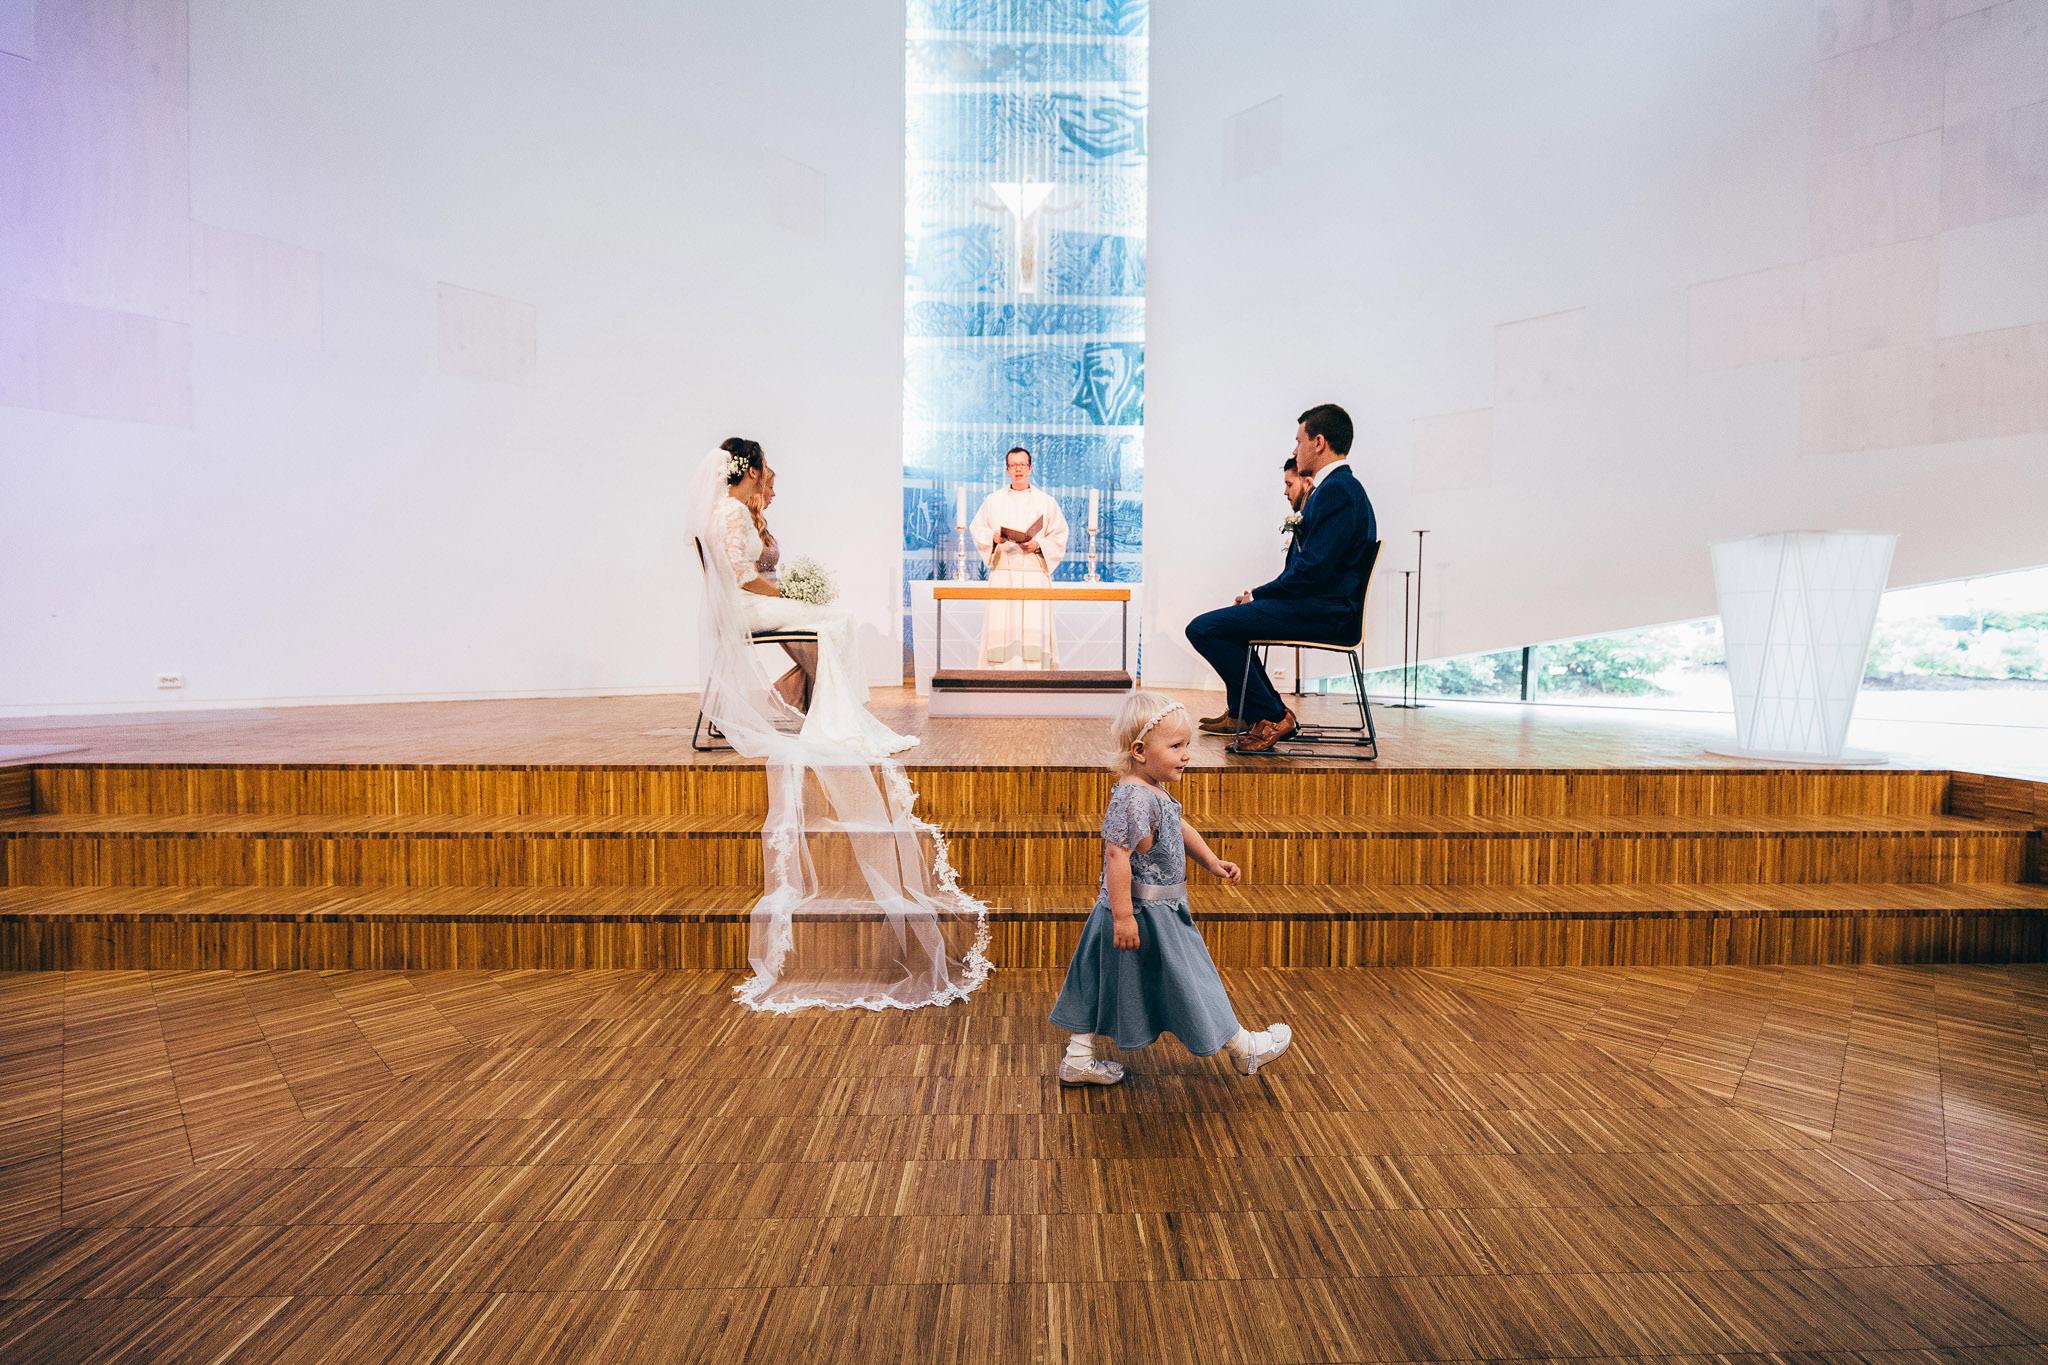 Norway+wedding+photographer+elopement+pre+wedding+Rogaland+bryllupsfotograf+Casey+Arneson-125.jpg